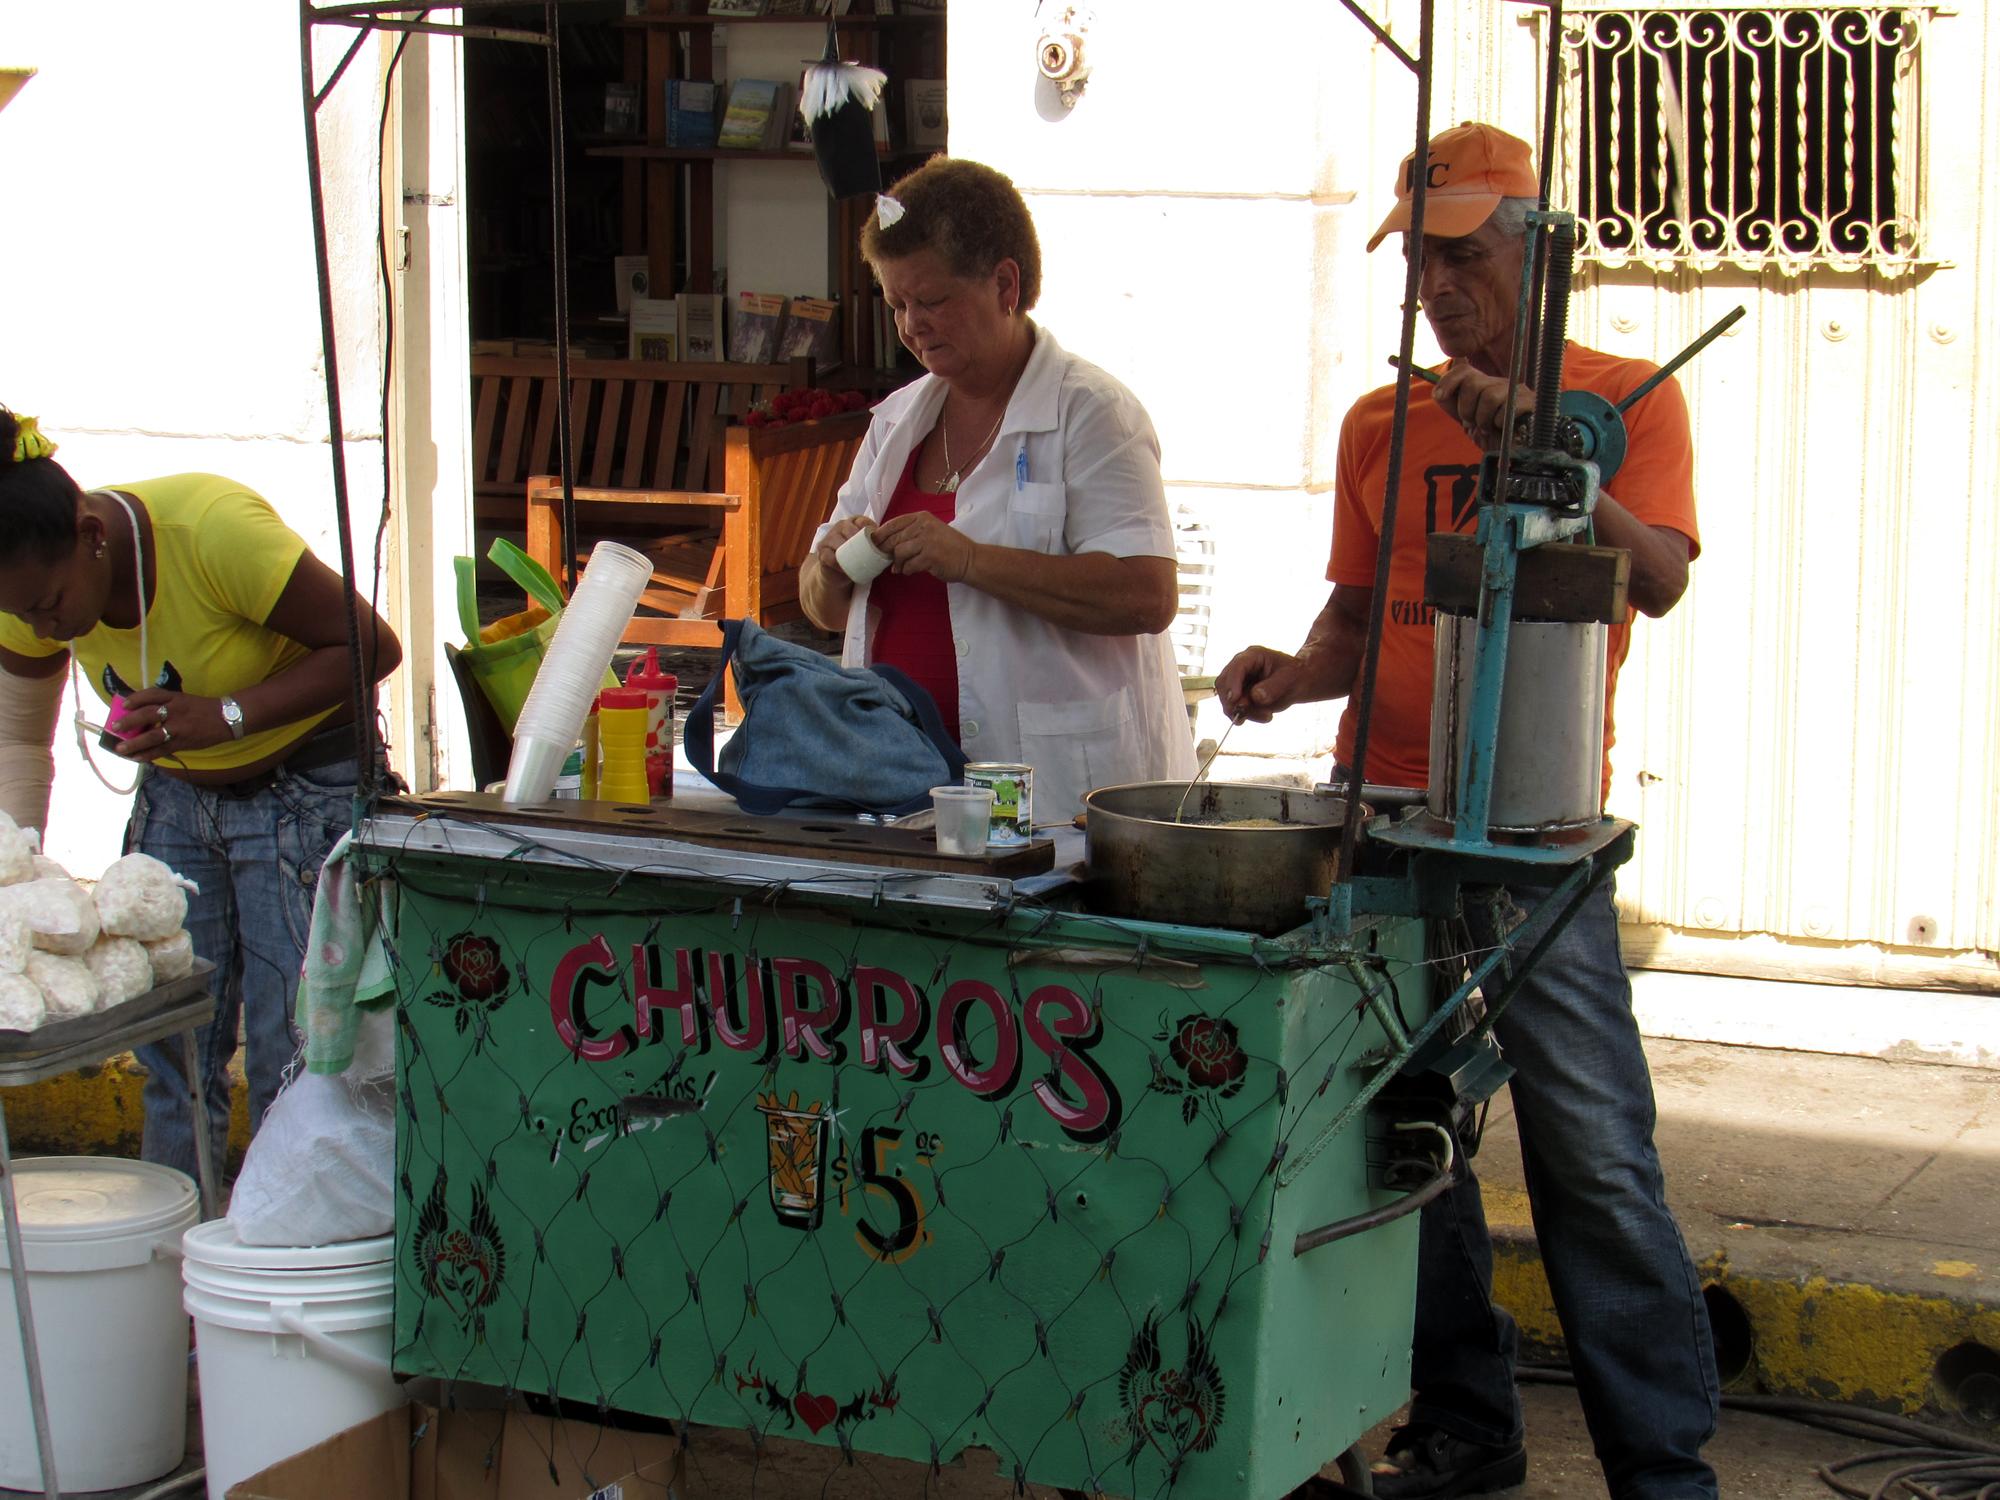 Selling churros on the street in Santa Clara